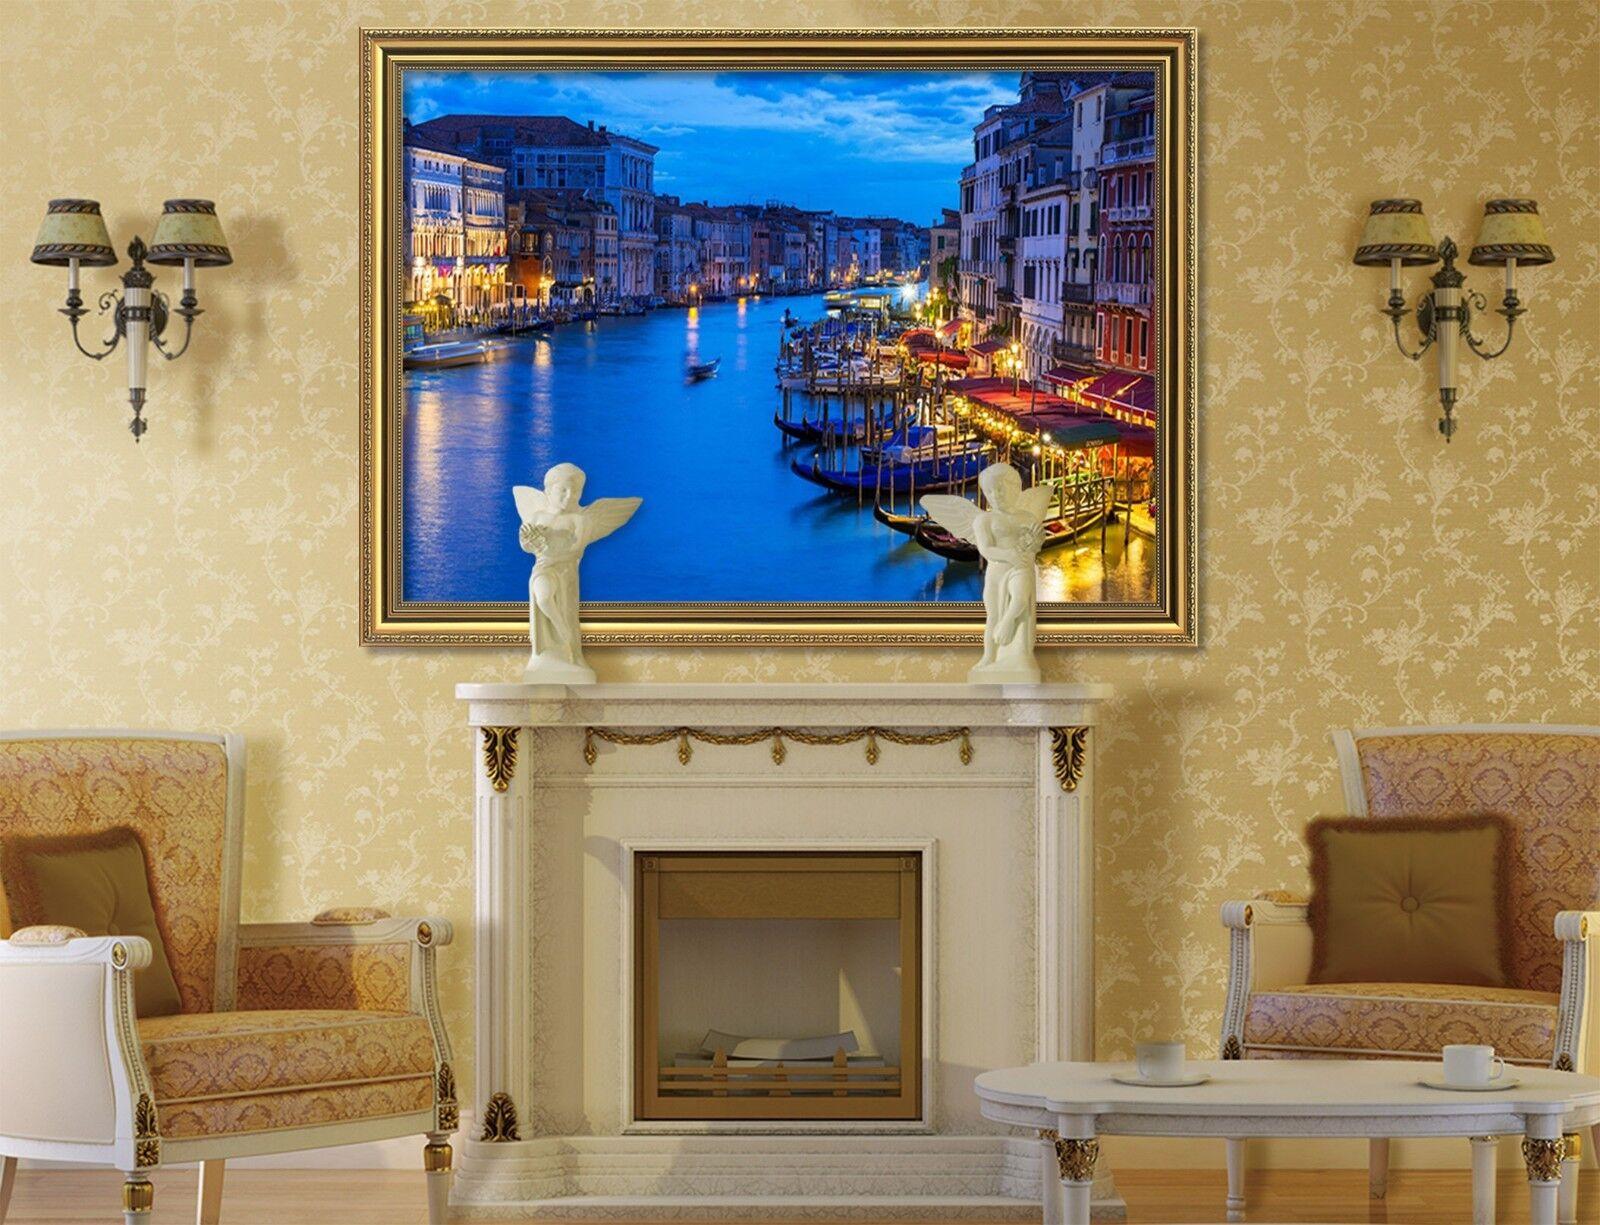 3D Night River City 6 Framed Poster Home Decor Print Painting Art AJ WALLPAPER